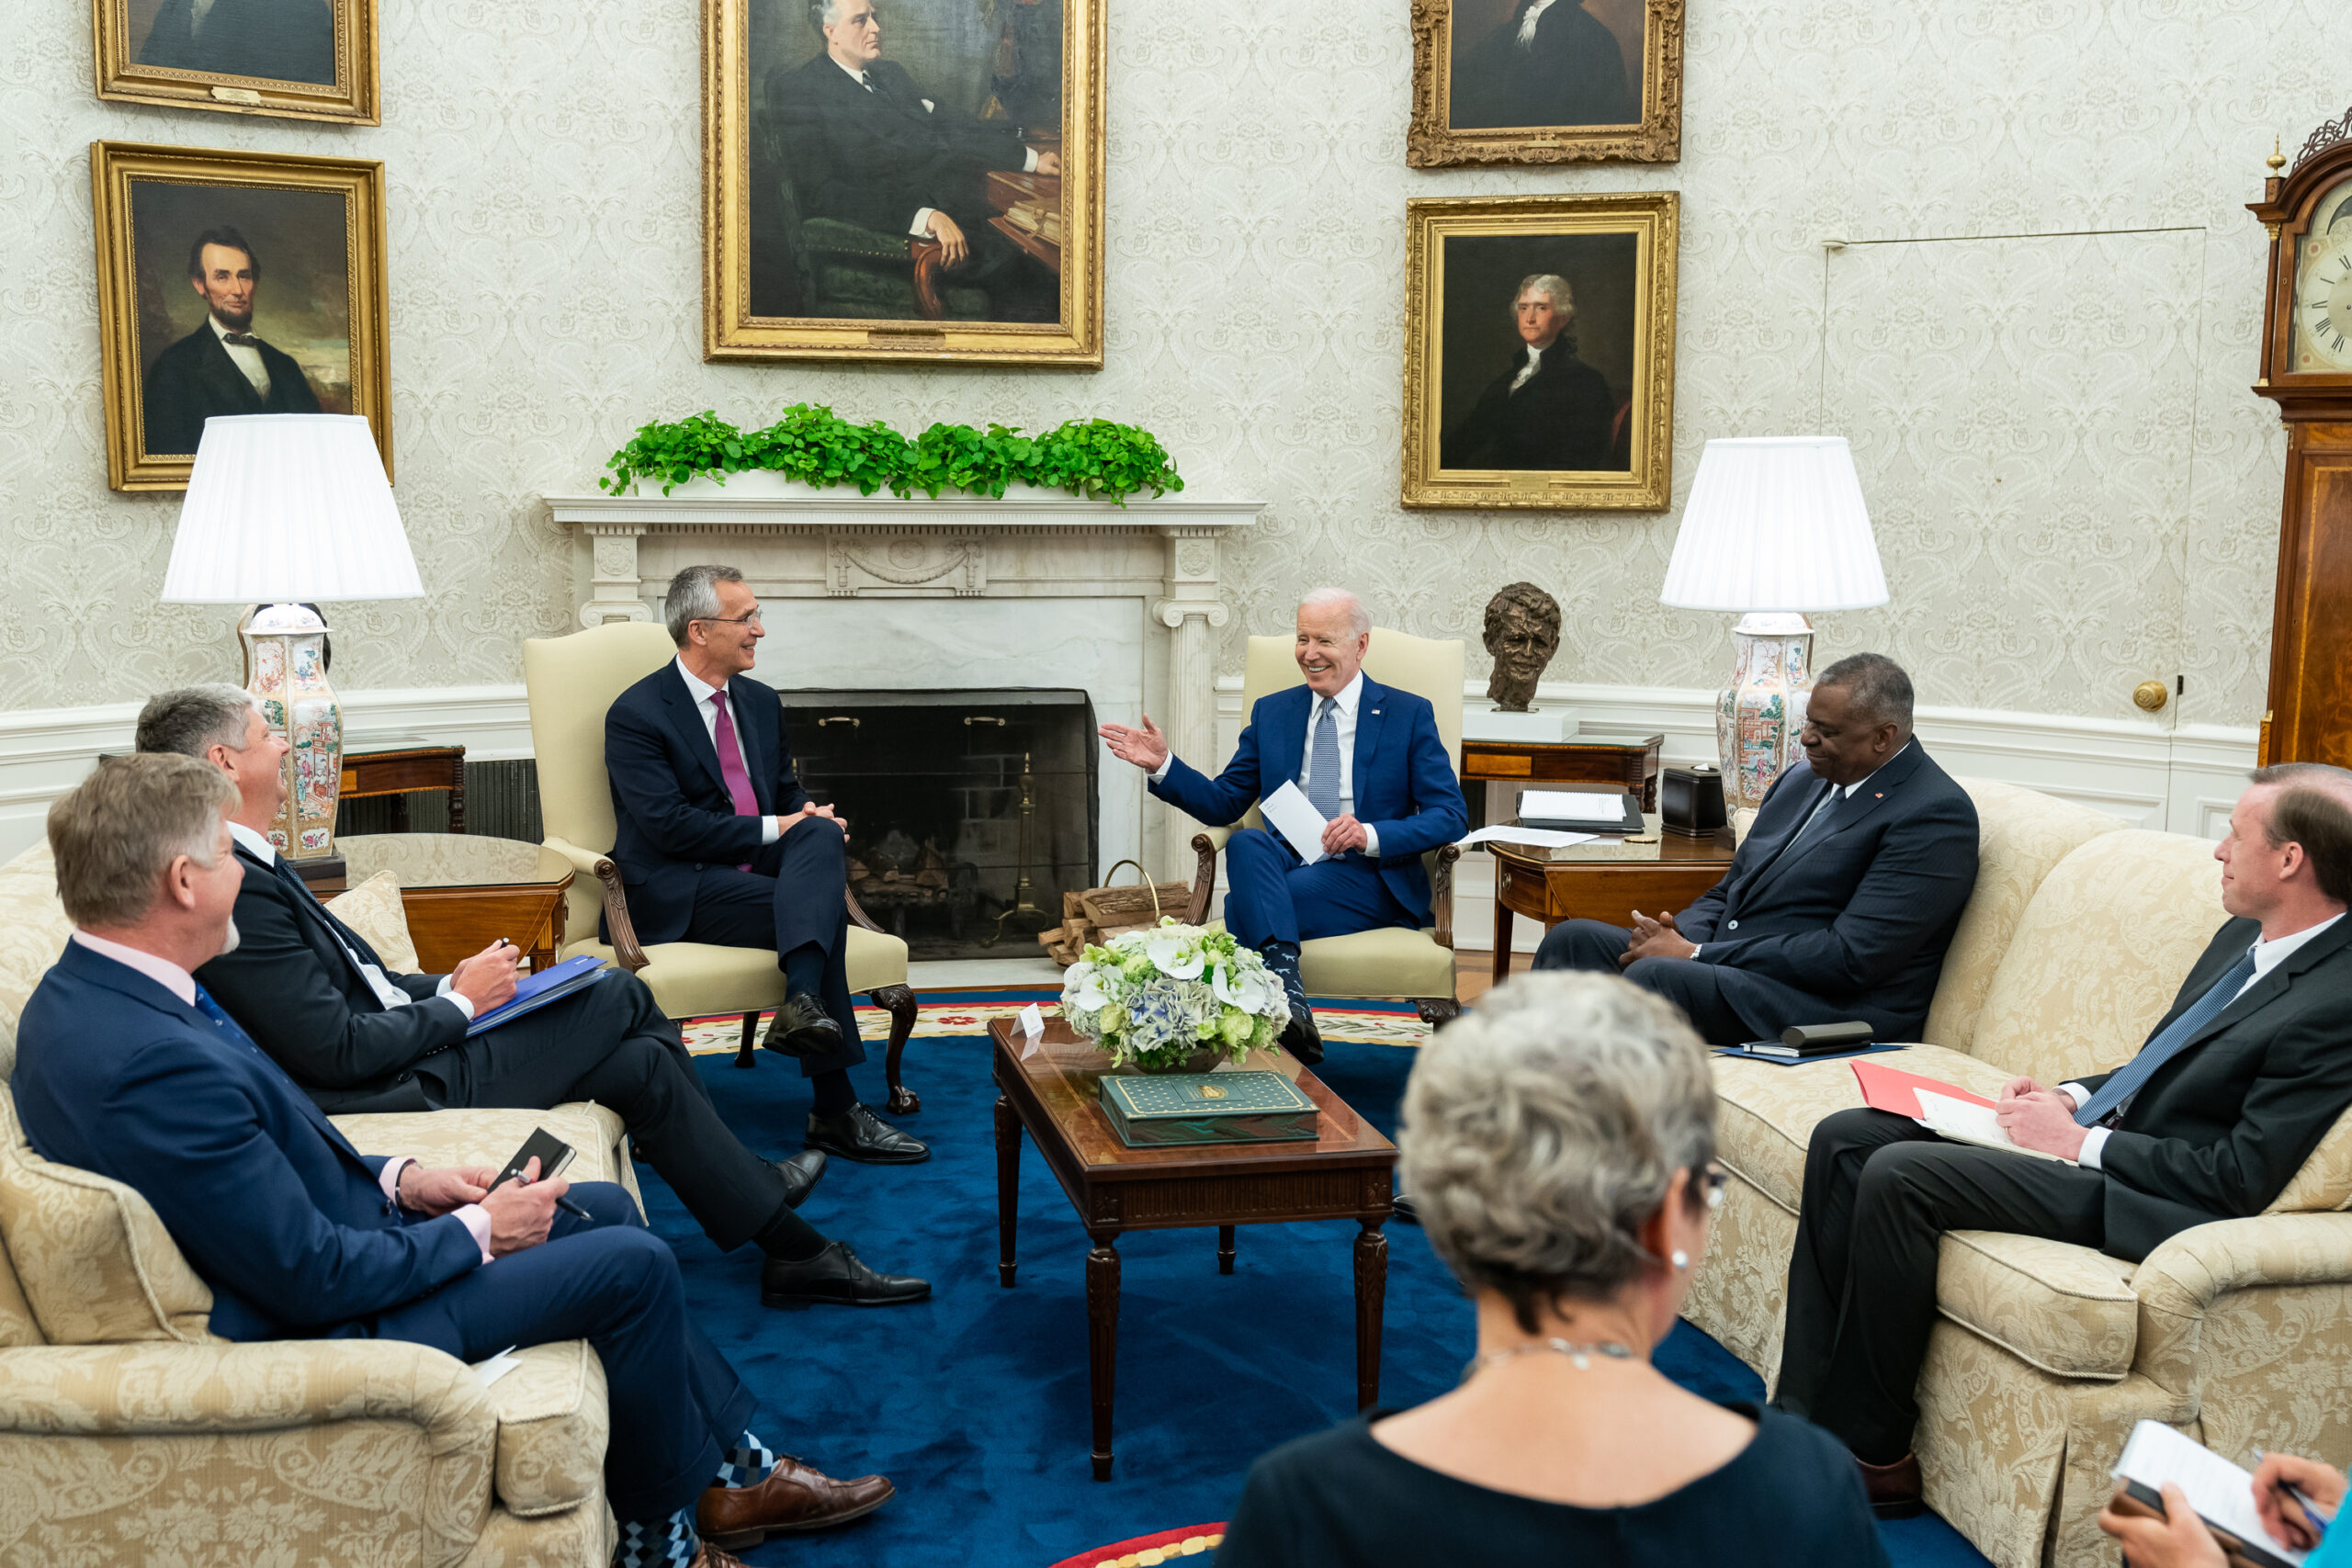 President Joe Biden meets with NATO Secretary General Jens Stoltenberg